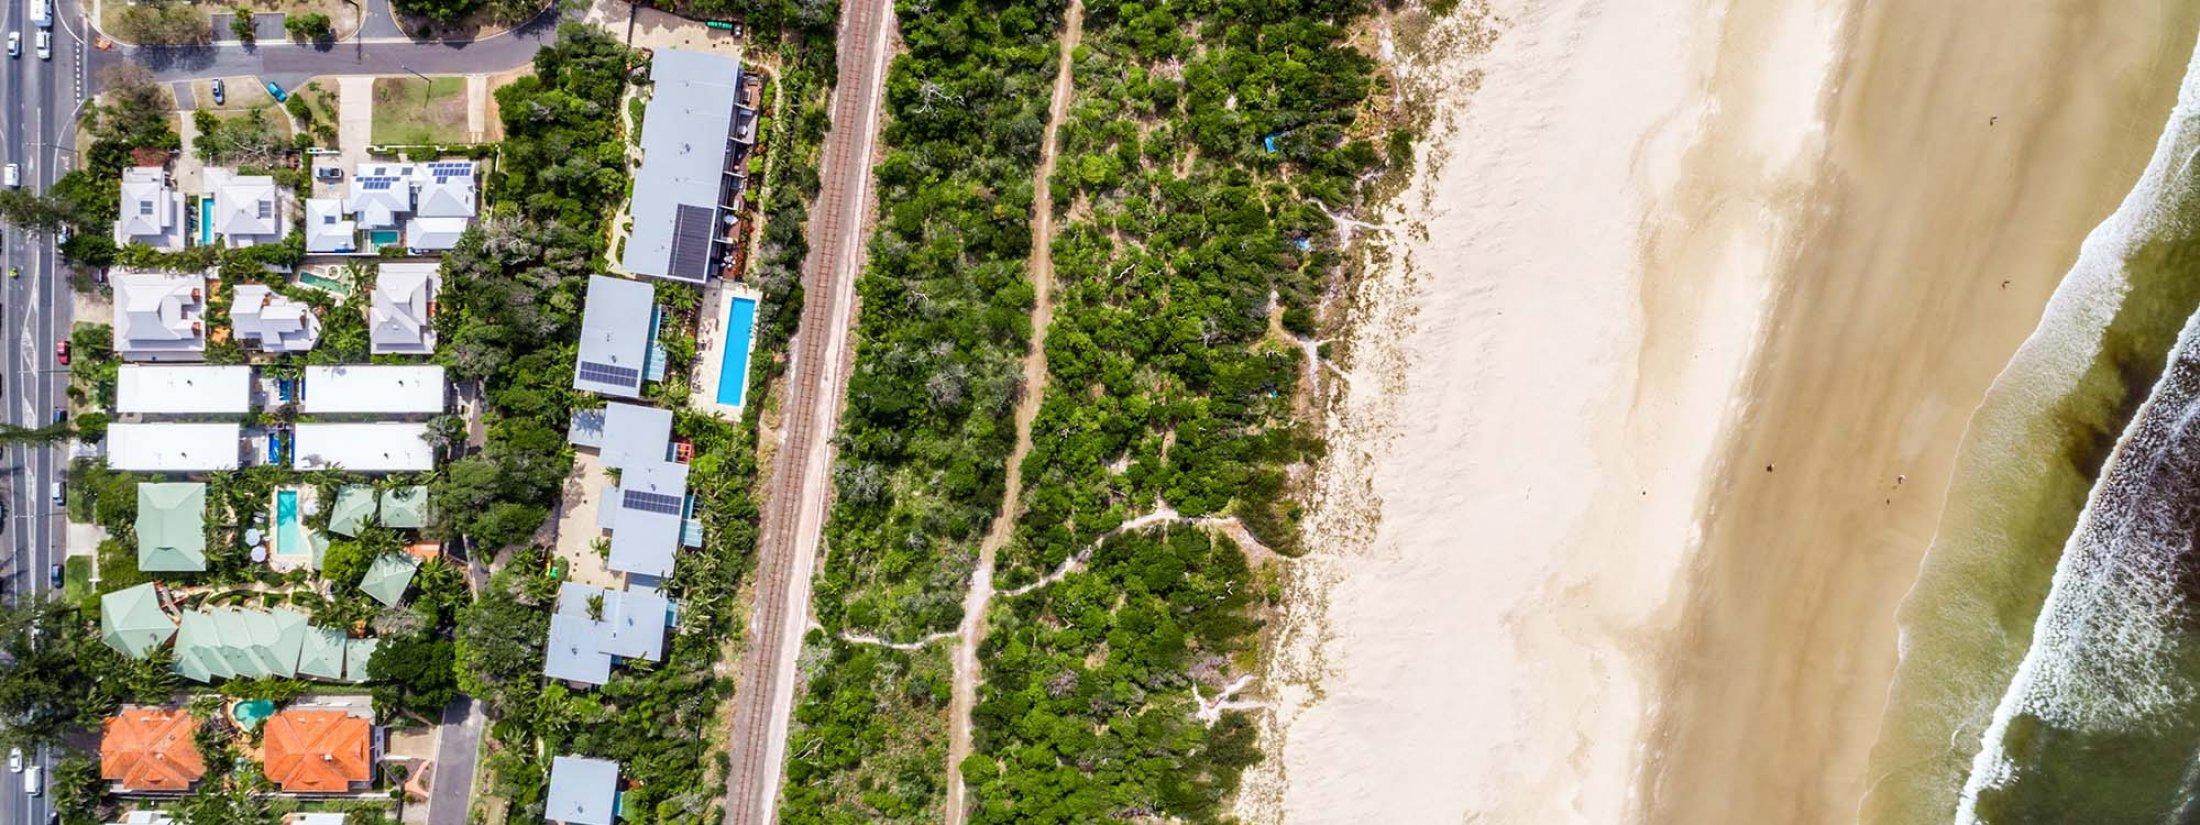 Kokos Beach Houses - Byron Bay - Aerial Straight Down to All Kokos and Beach